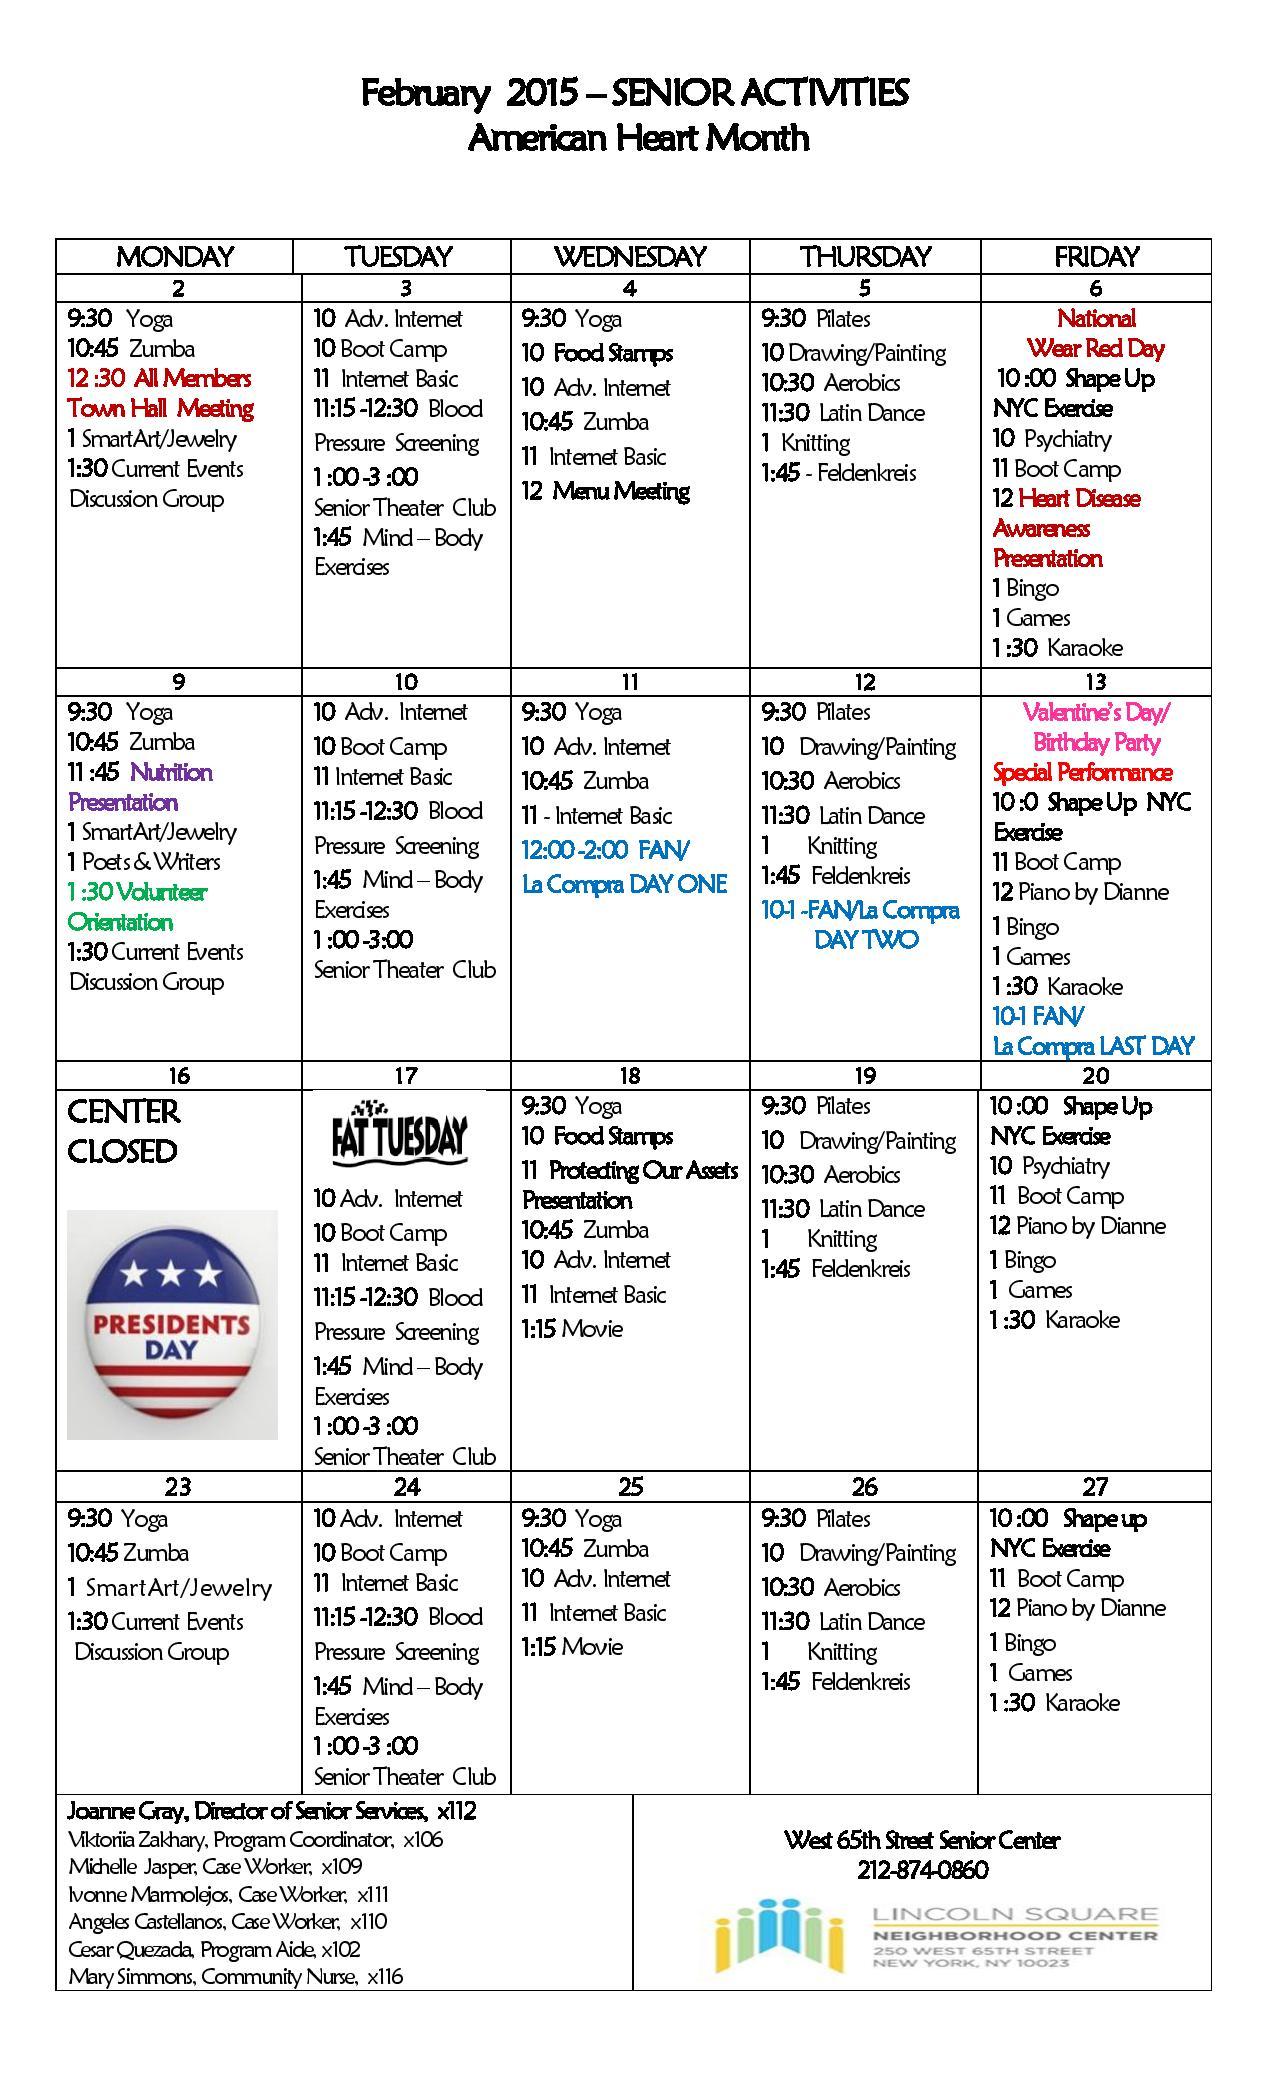 February  Calendar 2015 Activities-page-001.jpg